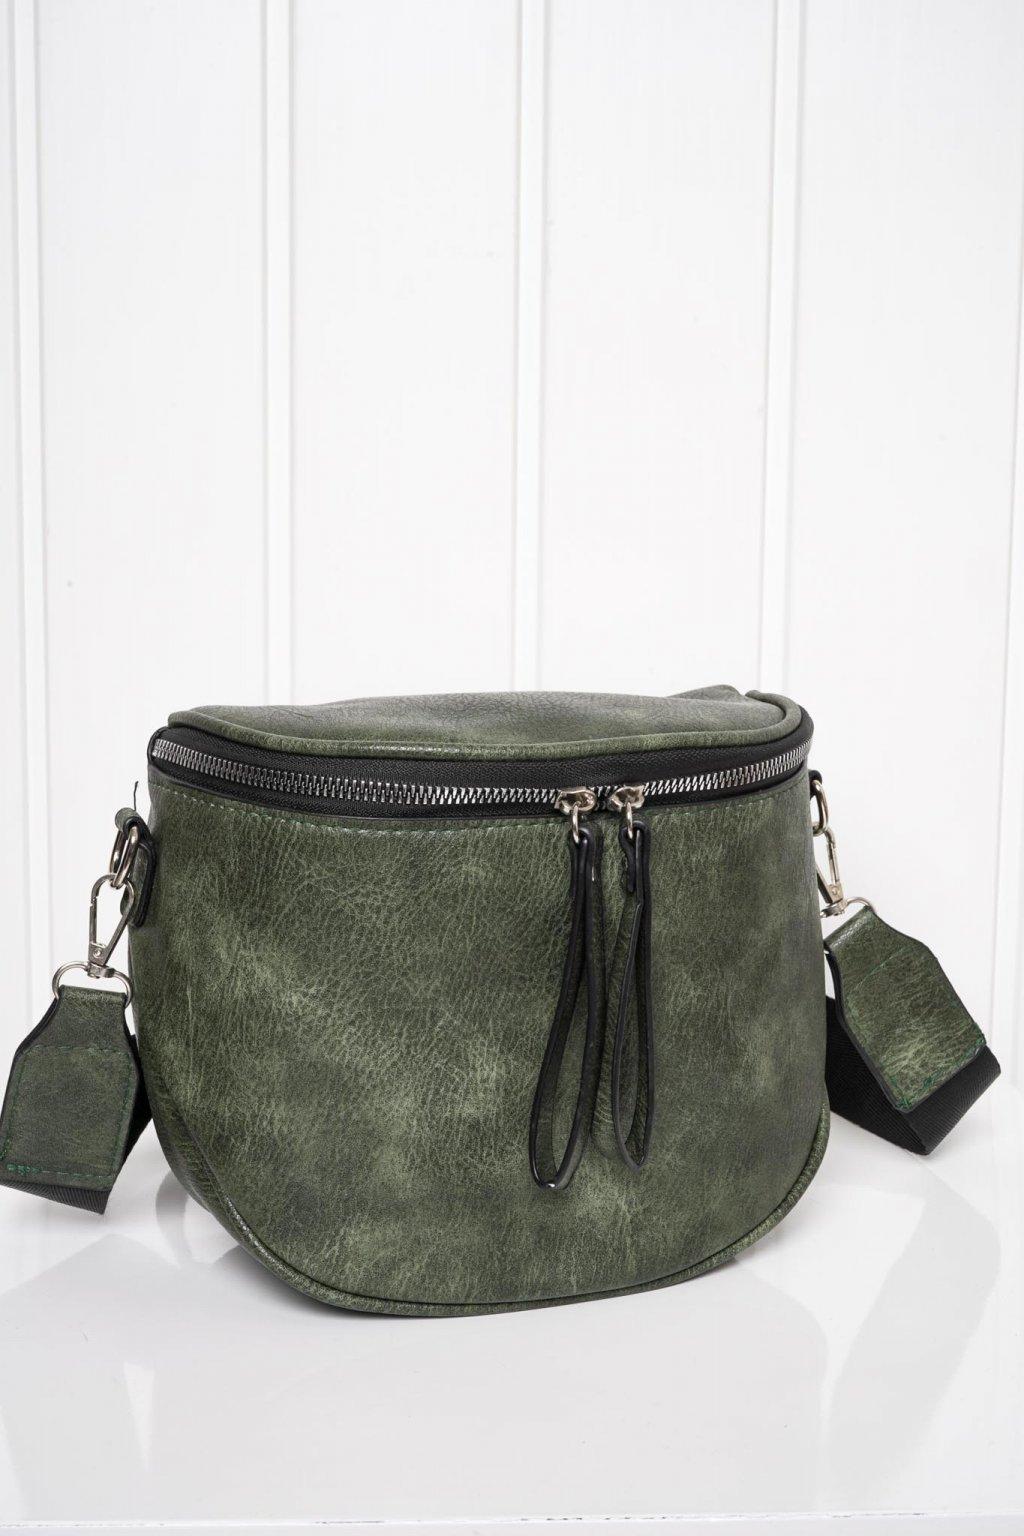 Kabelka, crossbody, ruksak, shopping bag, shopperka, 158